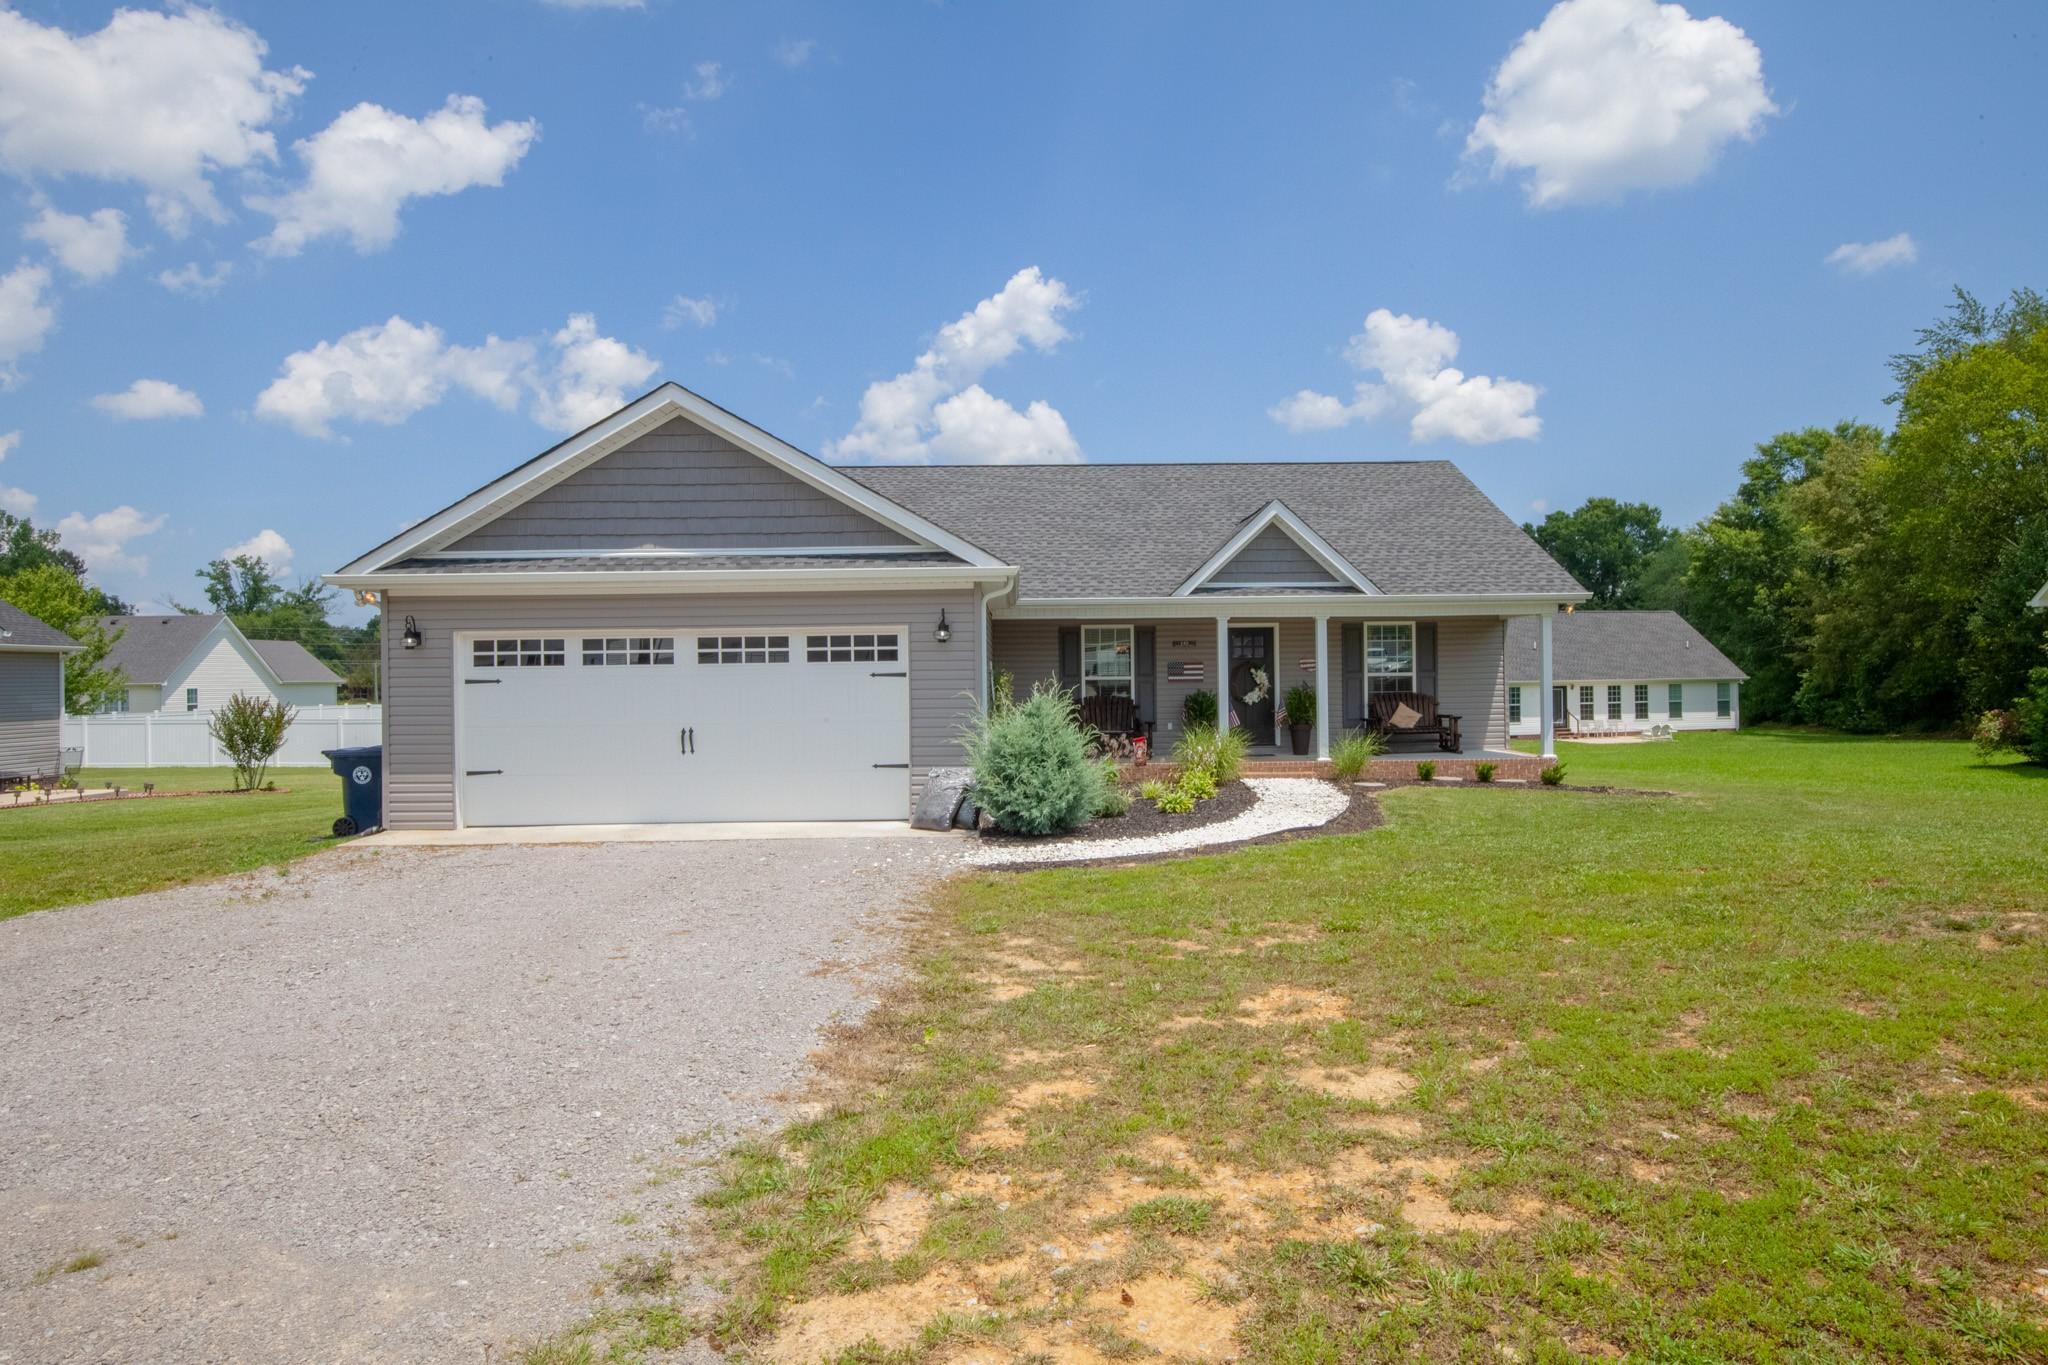 140 Autumn Evening St Property Photo - Smithville, TN real estate listing